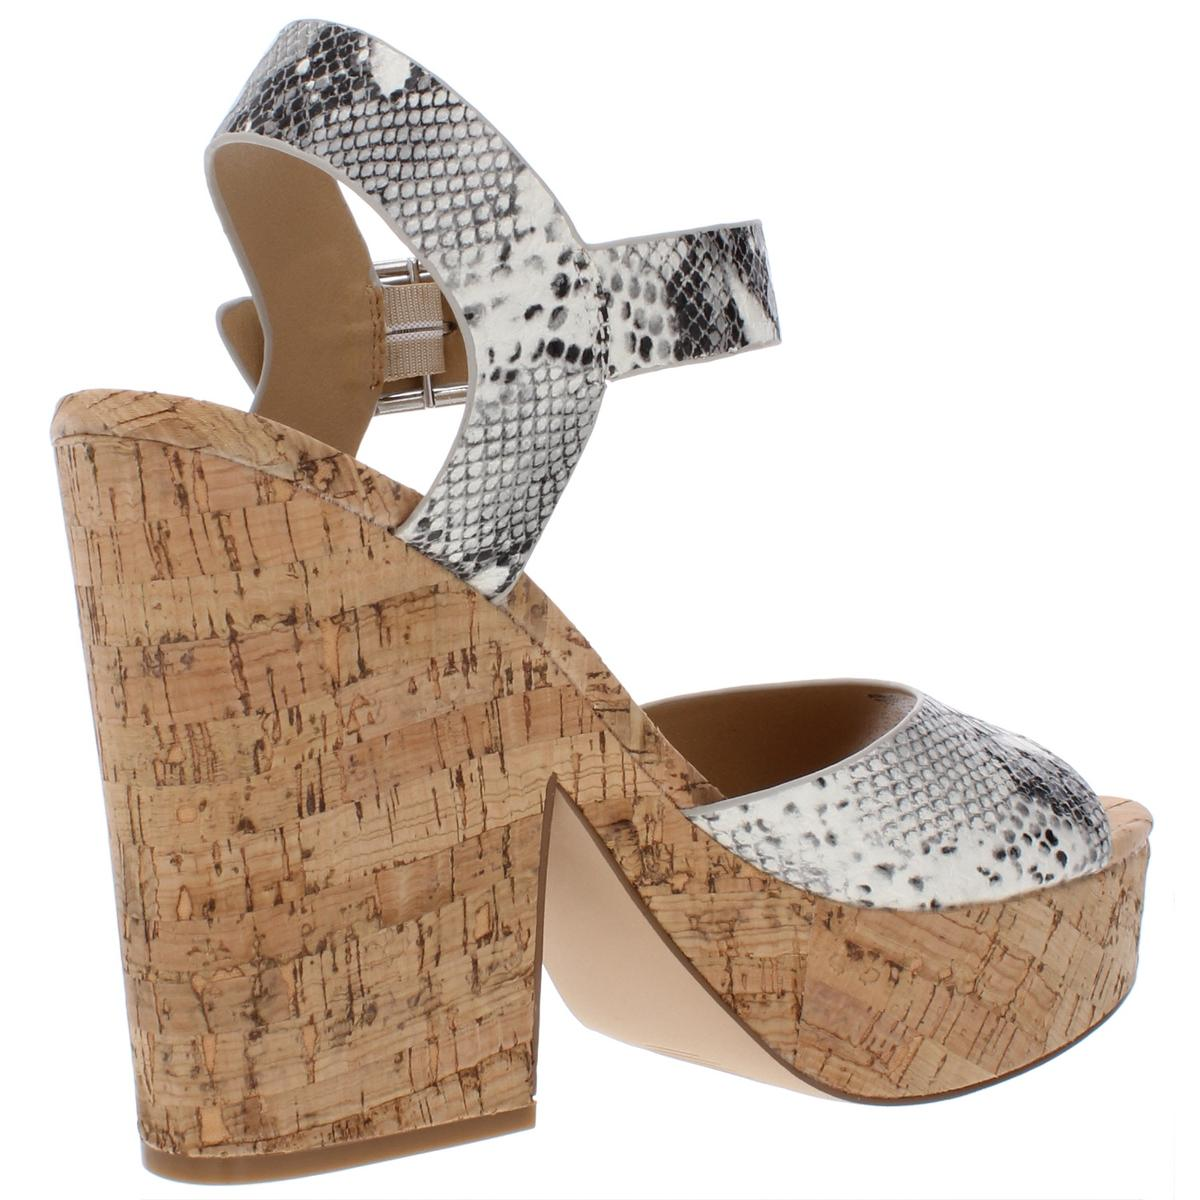 Steve Madden Womens Jess Open Toe Dressy Platform Sandals Shoes BHFO 0569